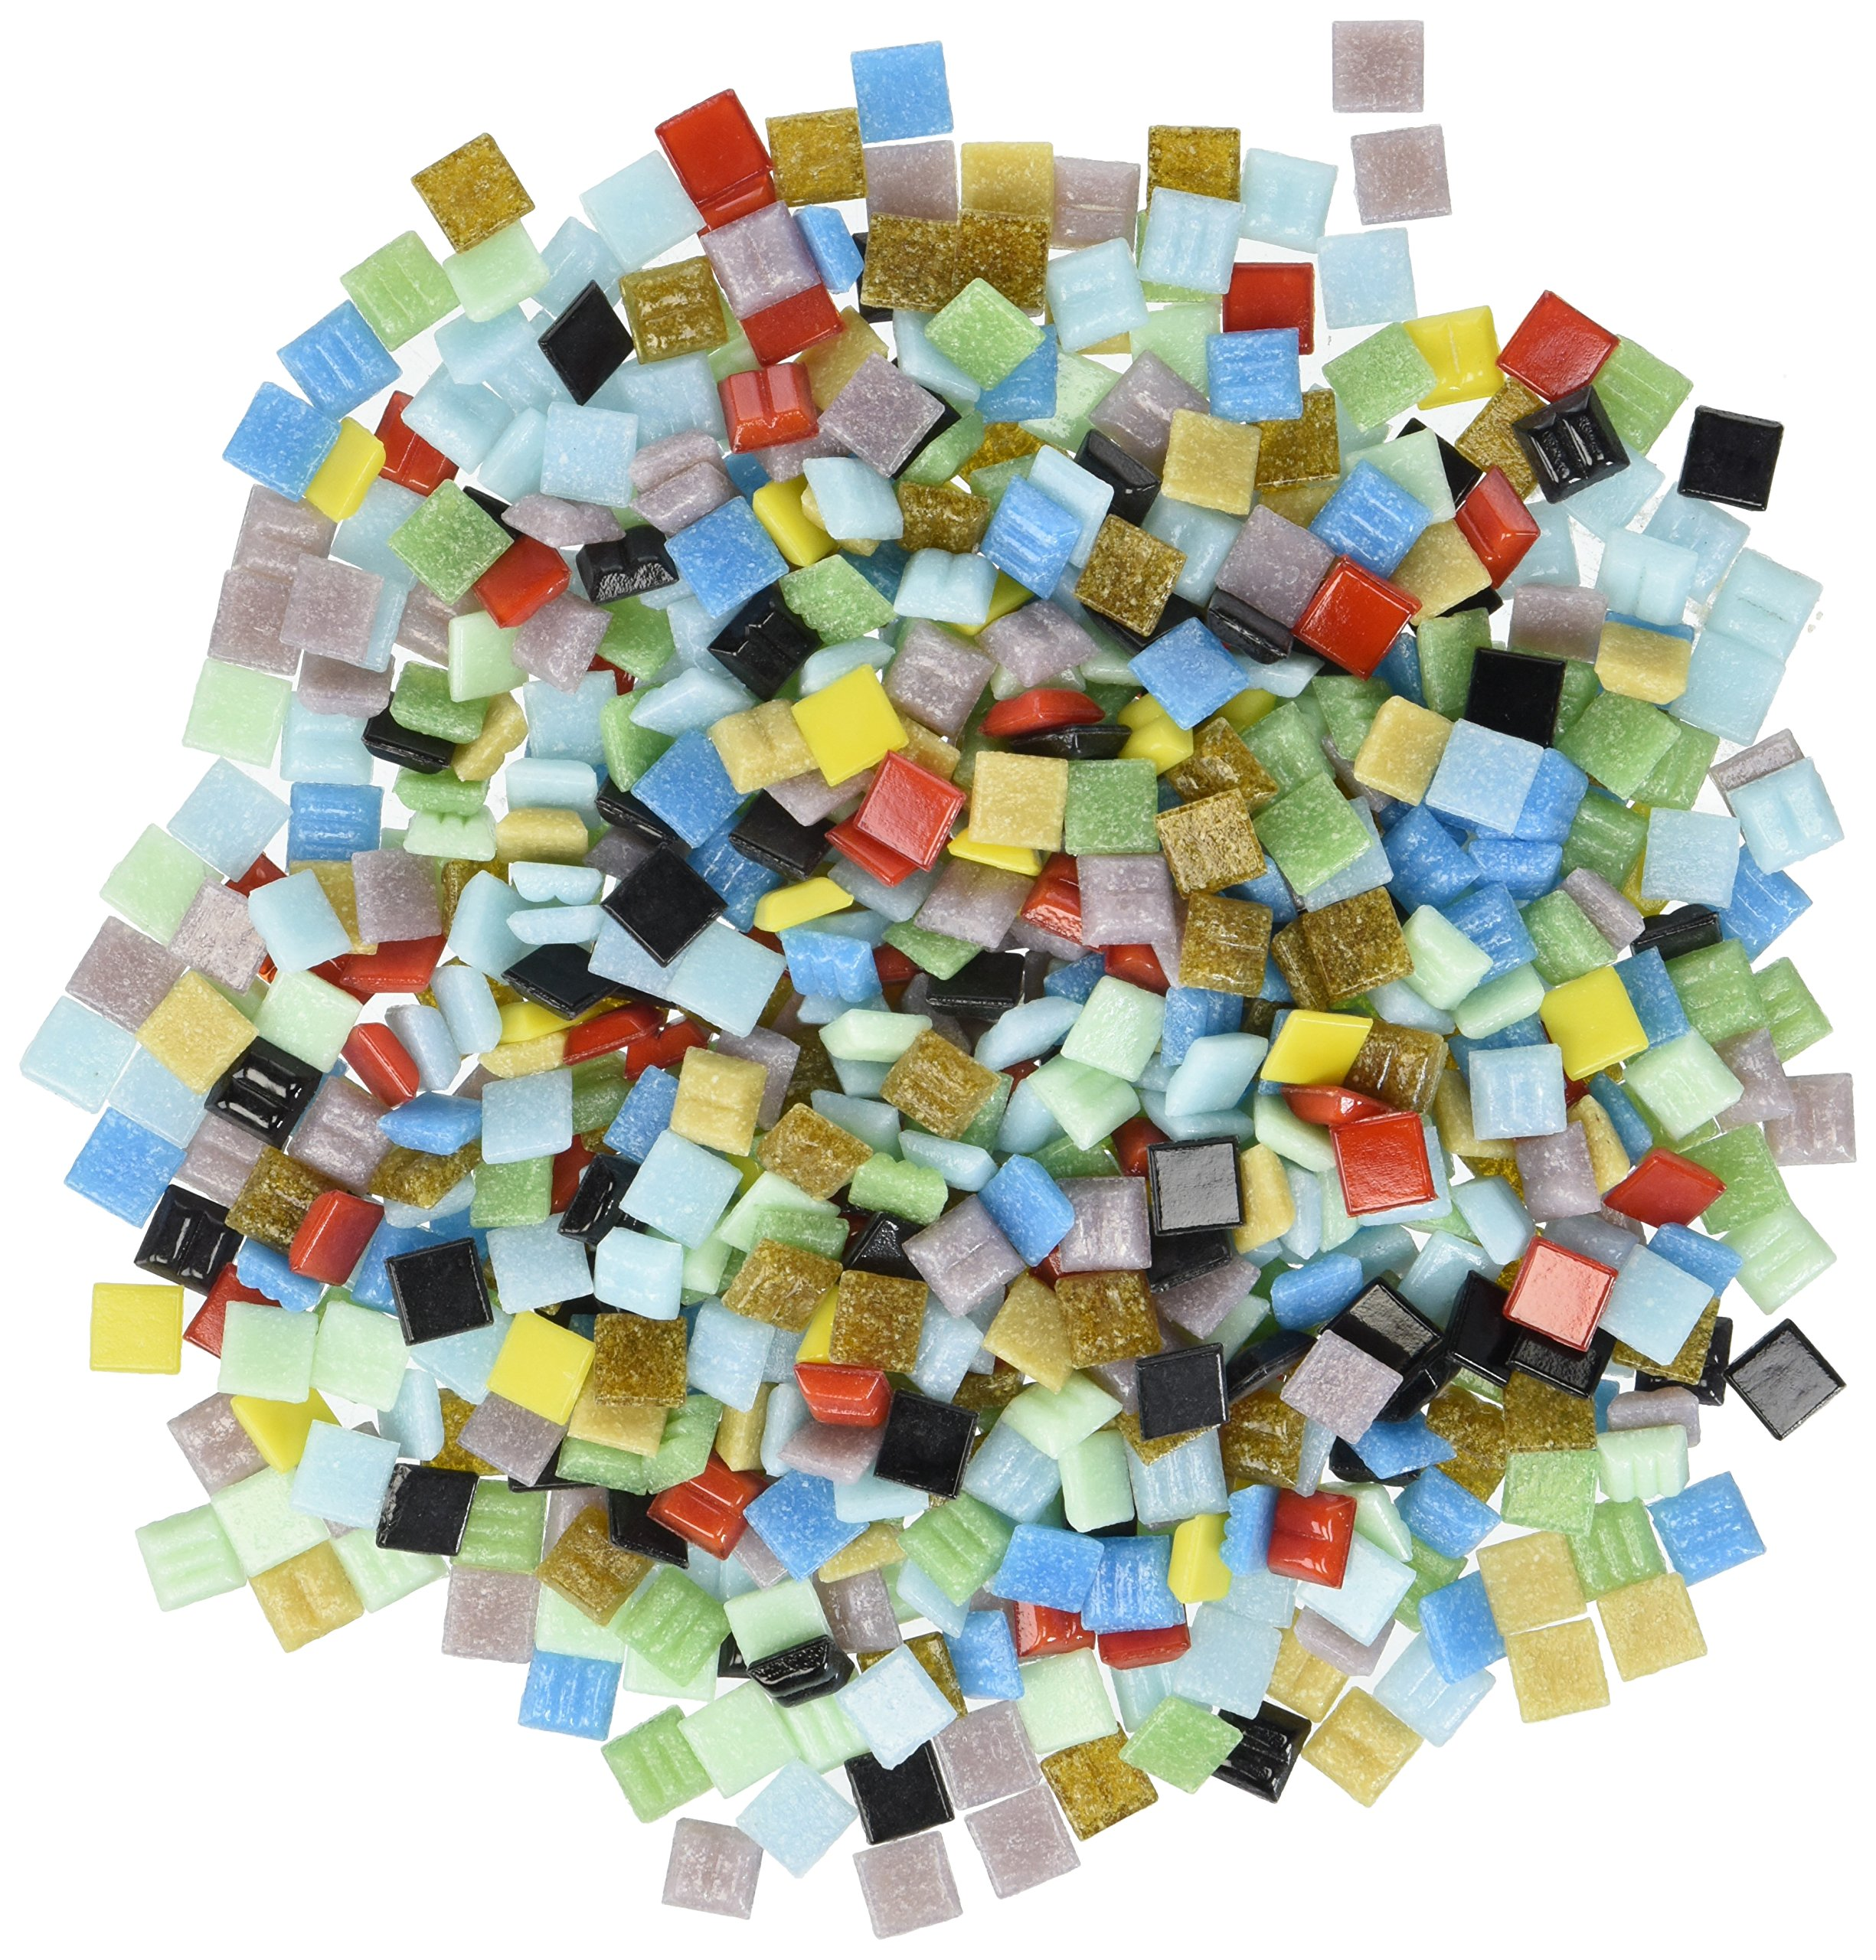 Mosaic Mercantile Vitreous Glass Mosaic Tiles - Assorted Colors - 3/8'' - 1 Pound Bag